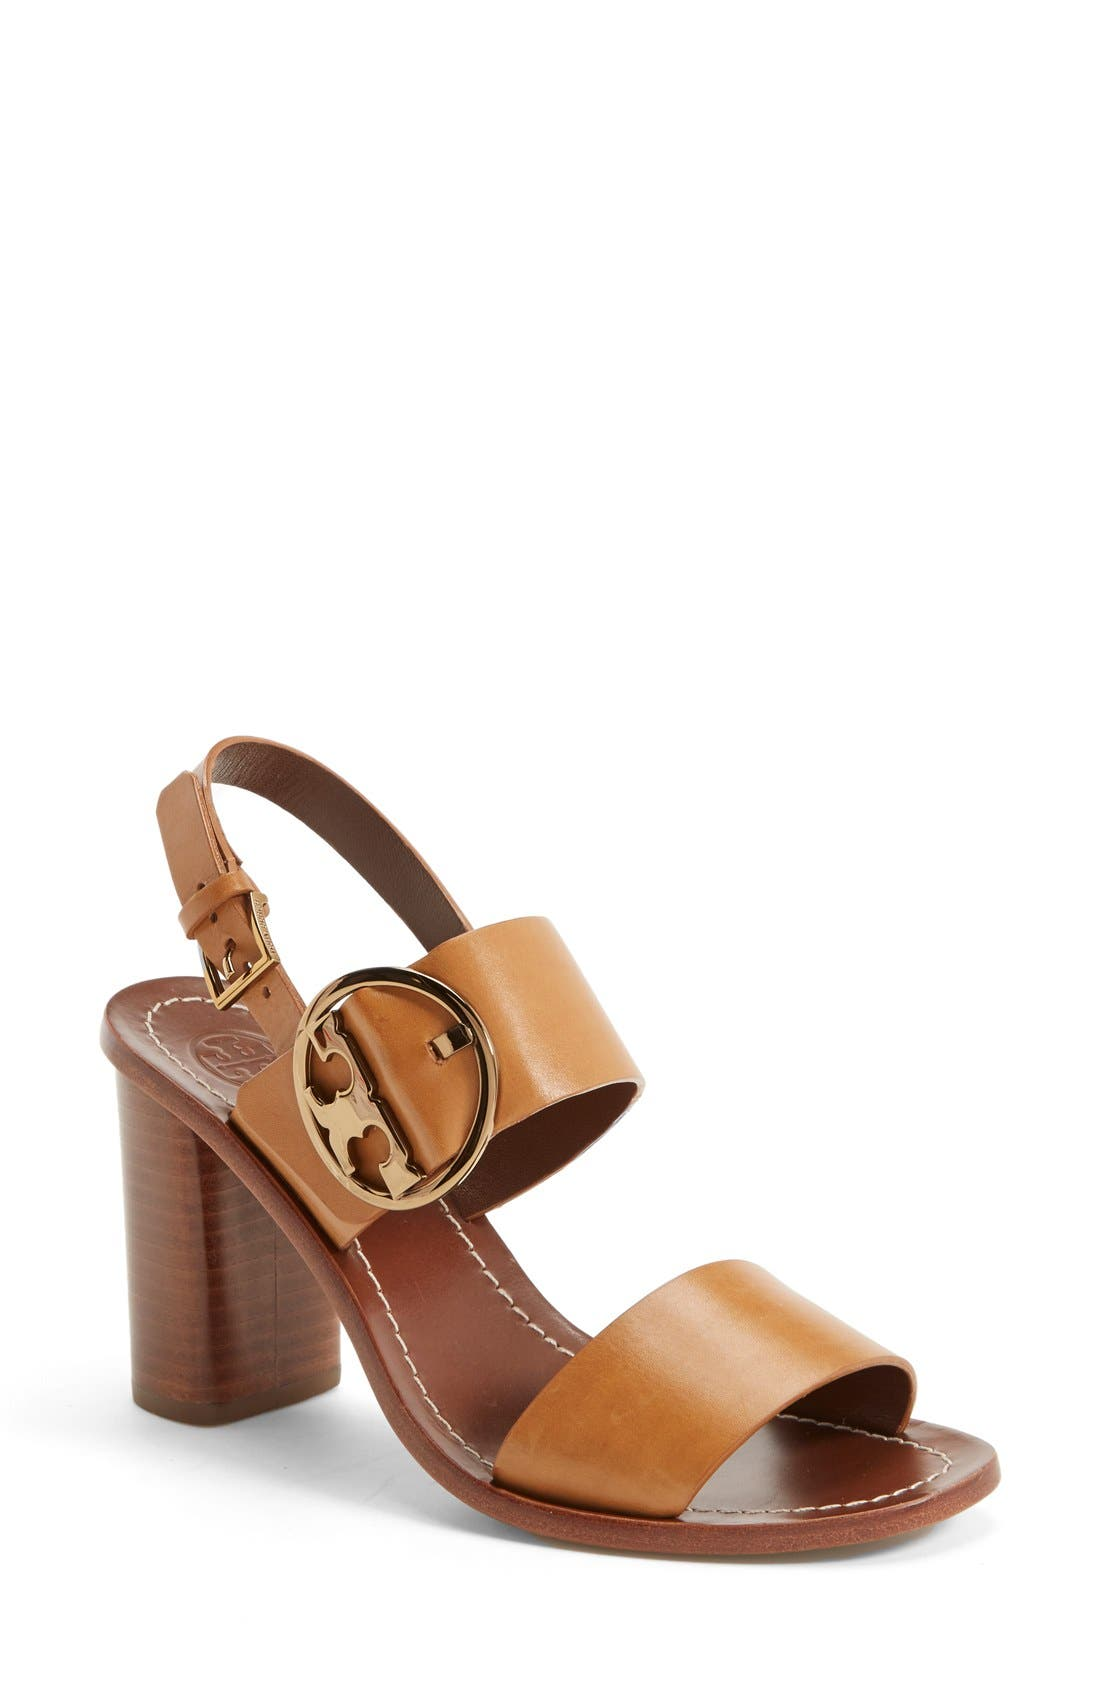 Main Image - Tory Burch 'Thames' Sandal (Women)